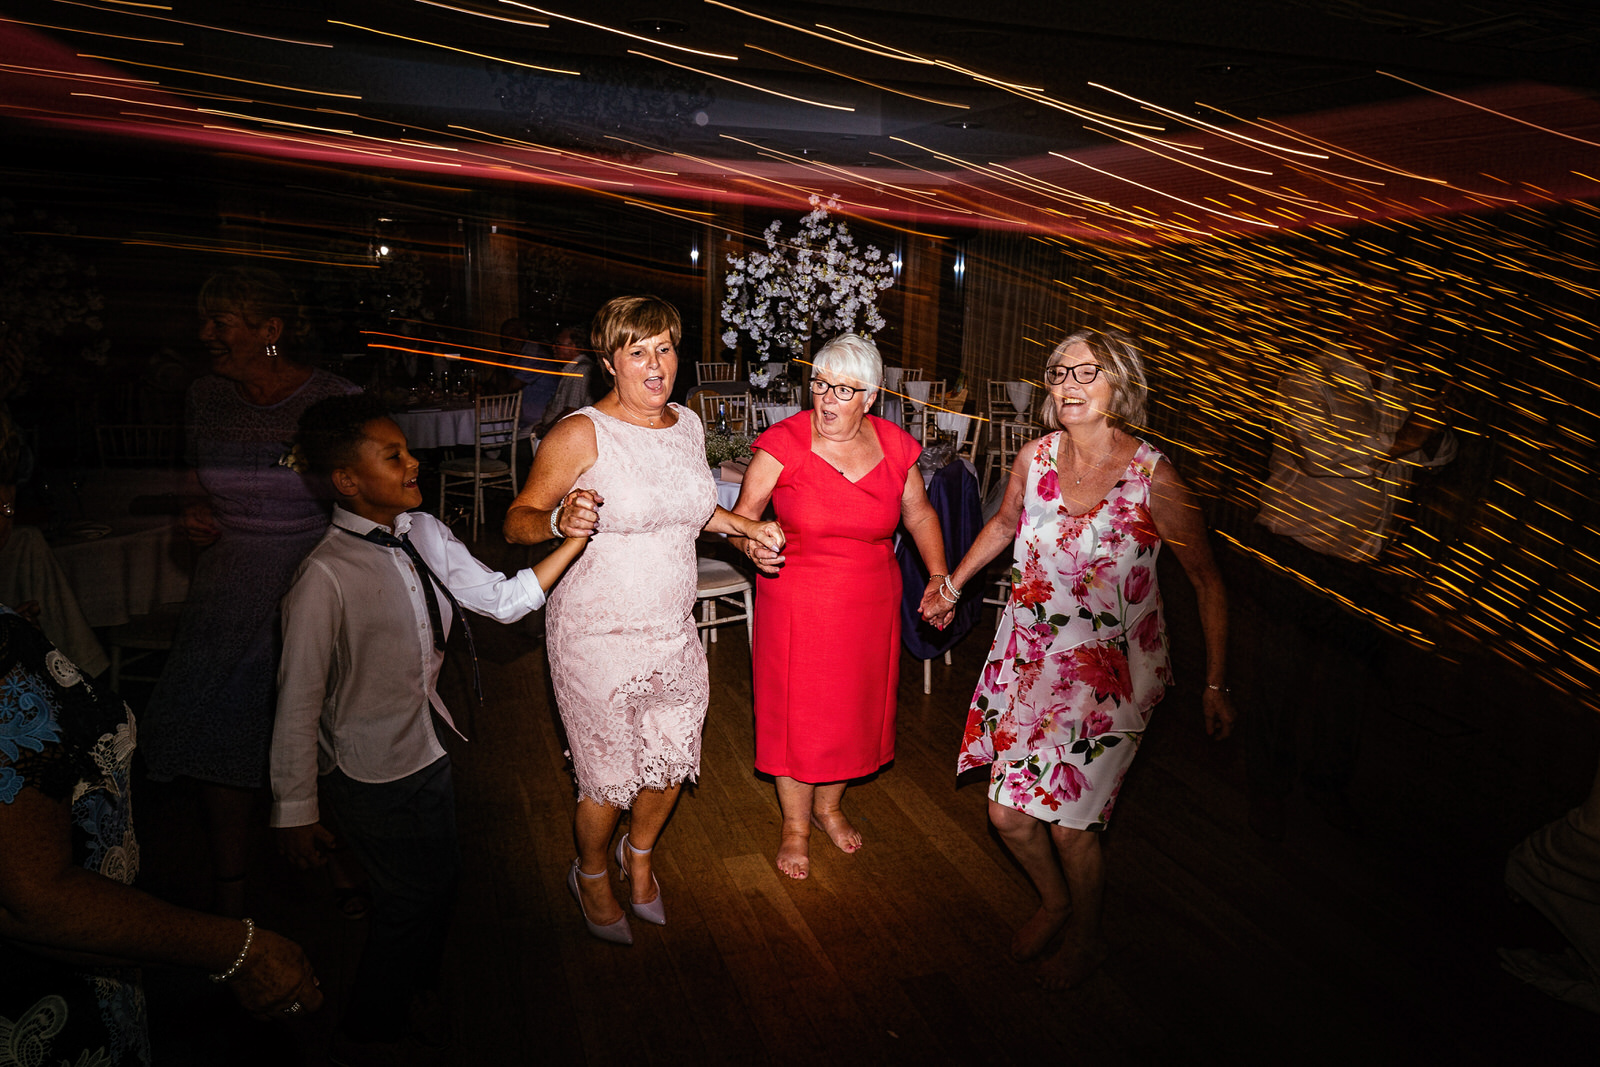 Moddershall-Oaks-Spa-Wedding-Photographer-073.jpg